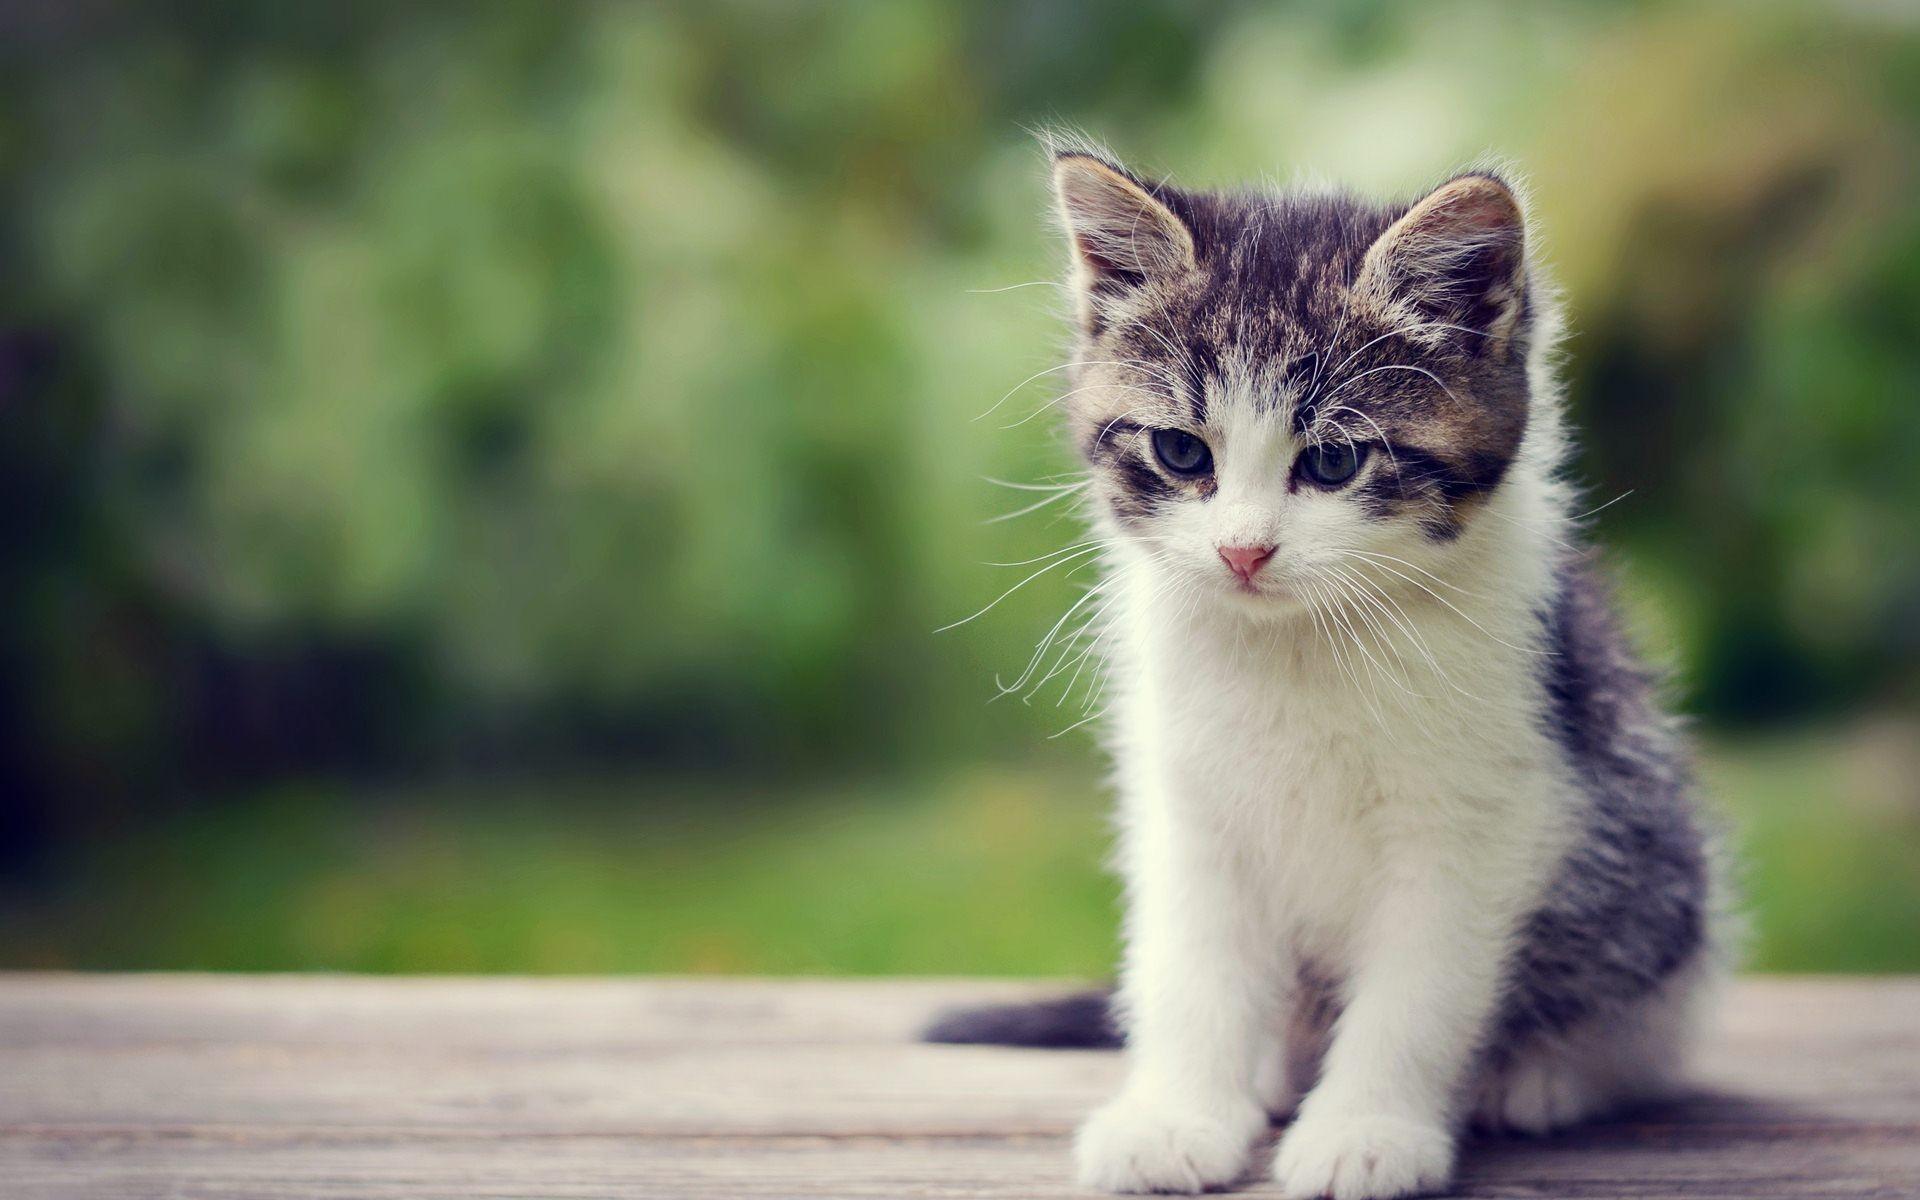 Wallpaper Of Kittens – wallpaper hd